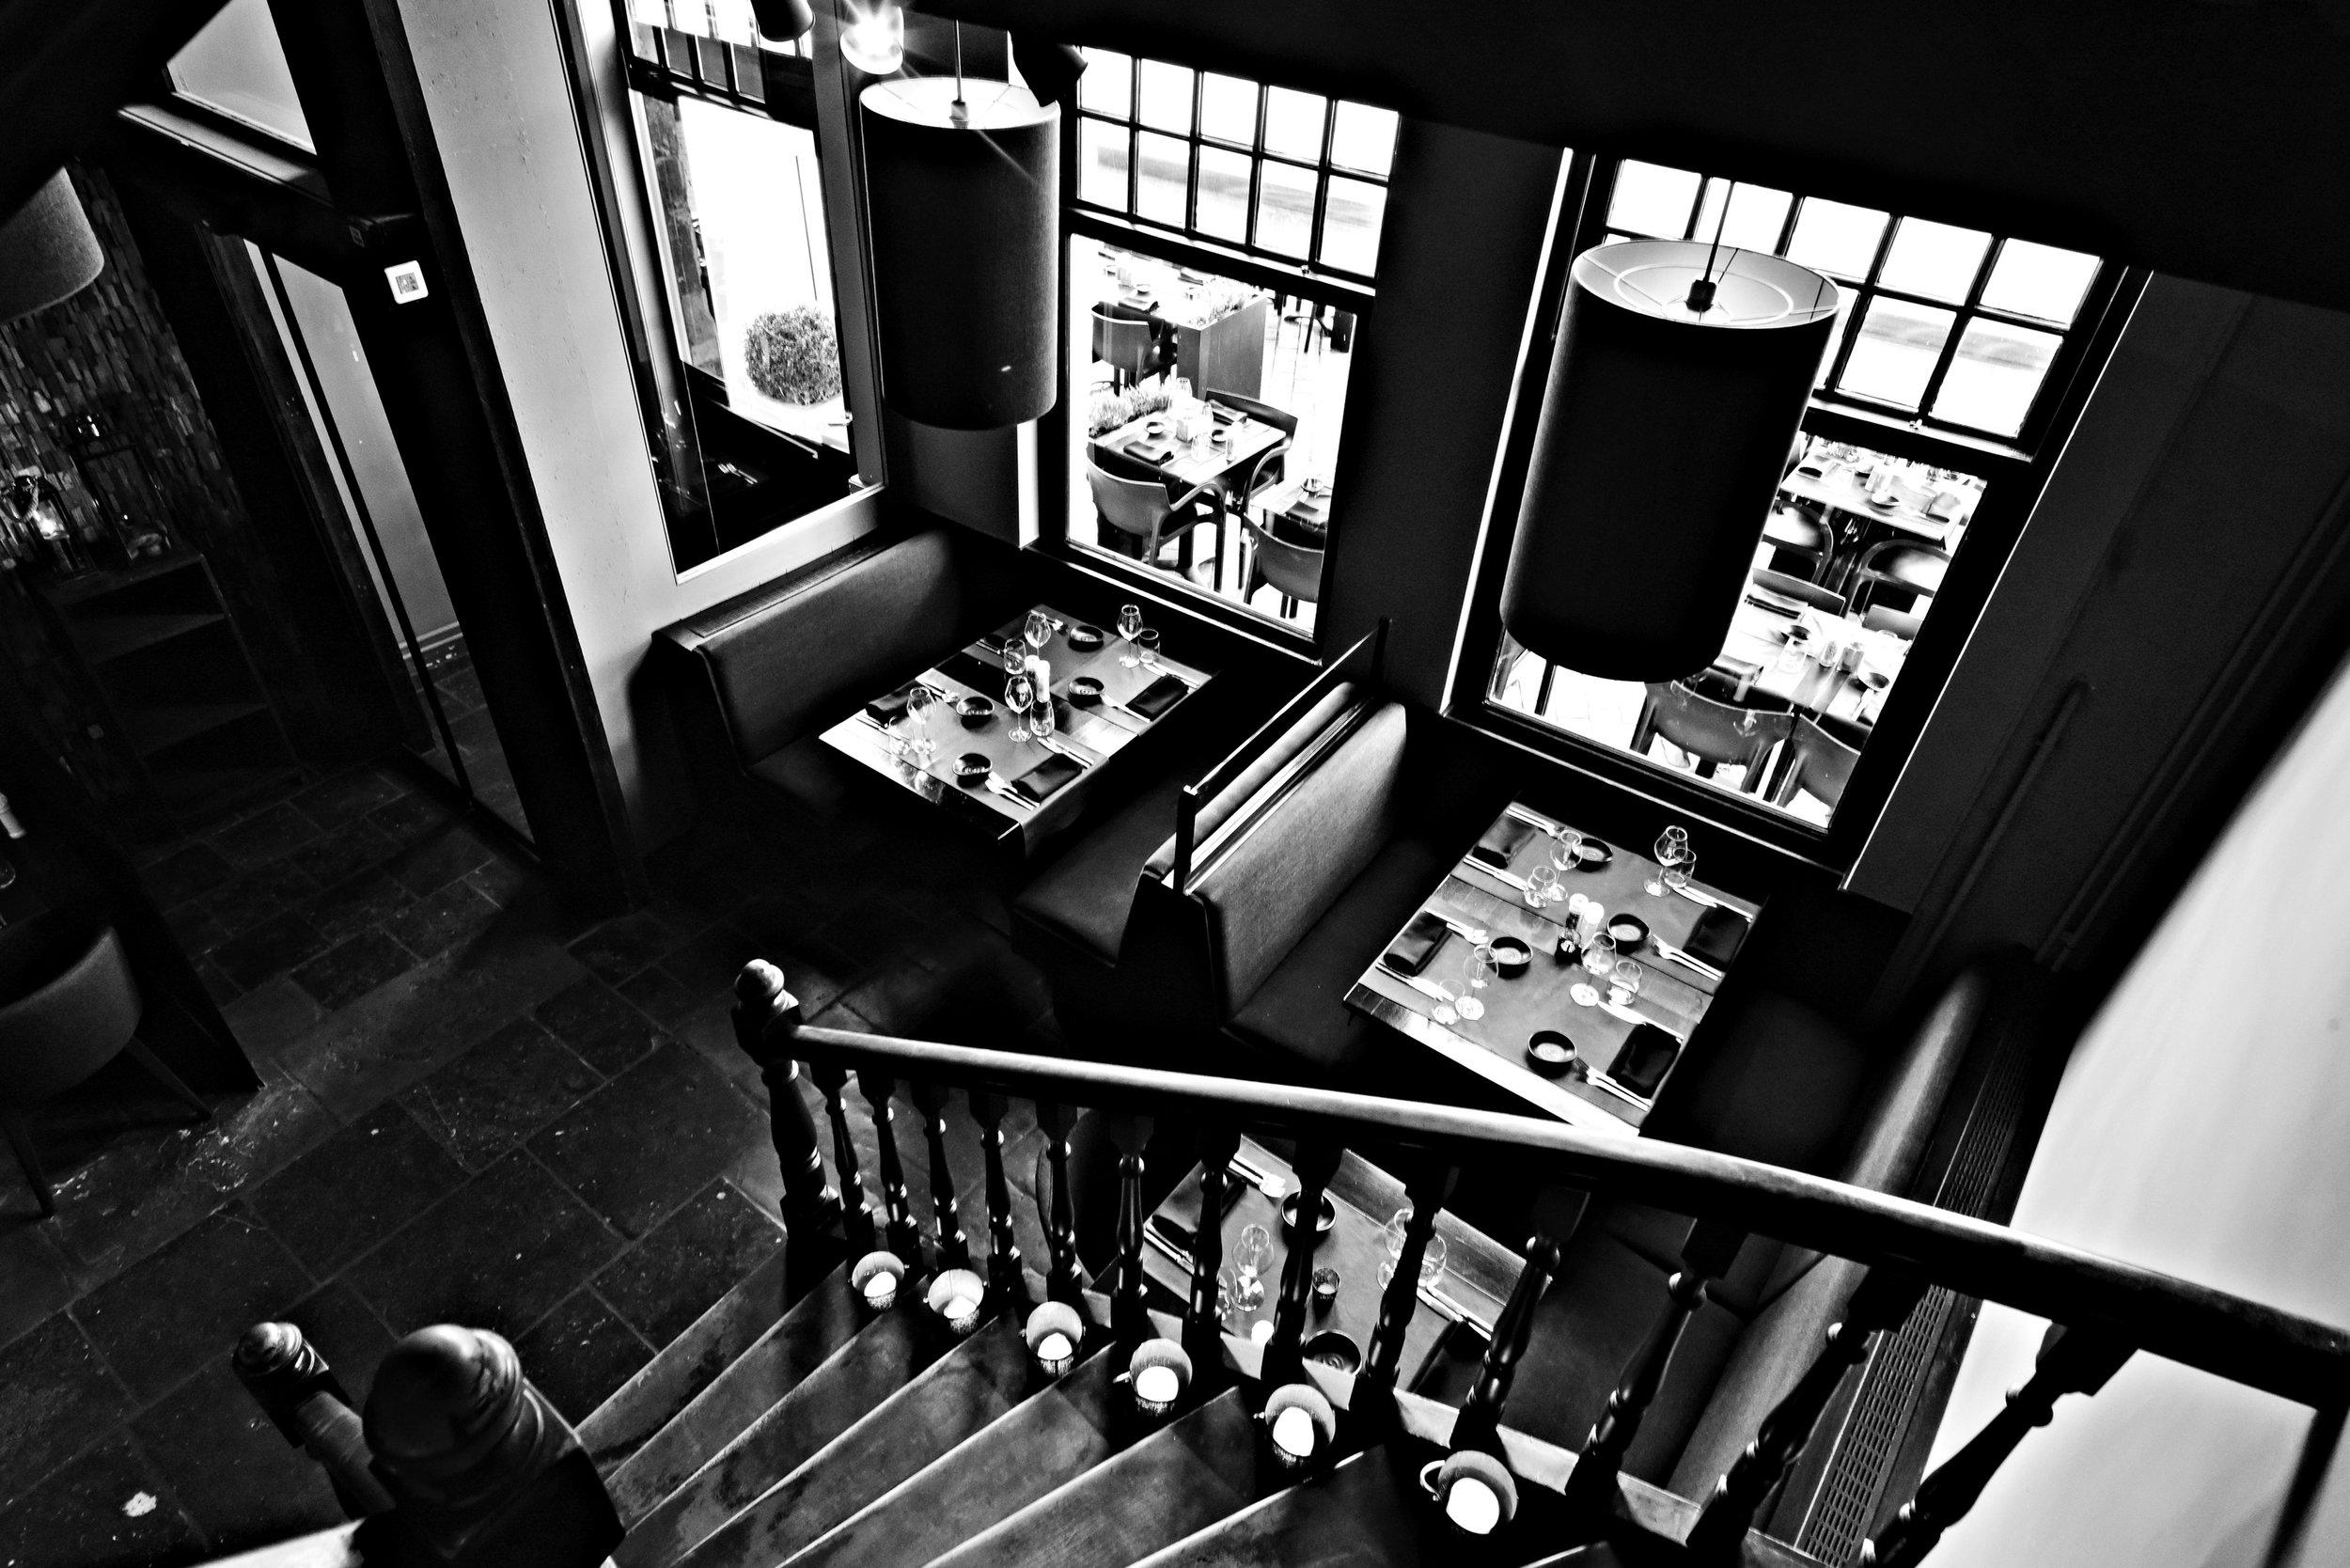 5 brasserie restaurant barleys barley's dendermonde grote markt bart albrecht tablefever.jpg